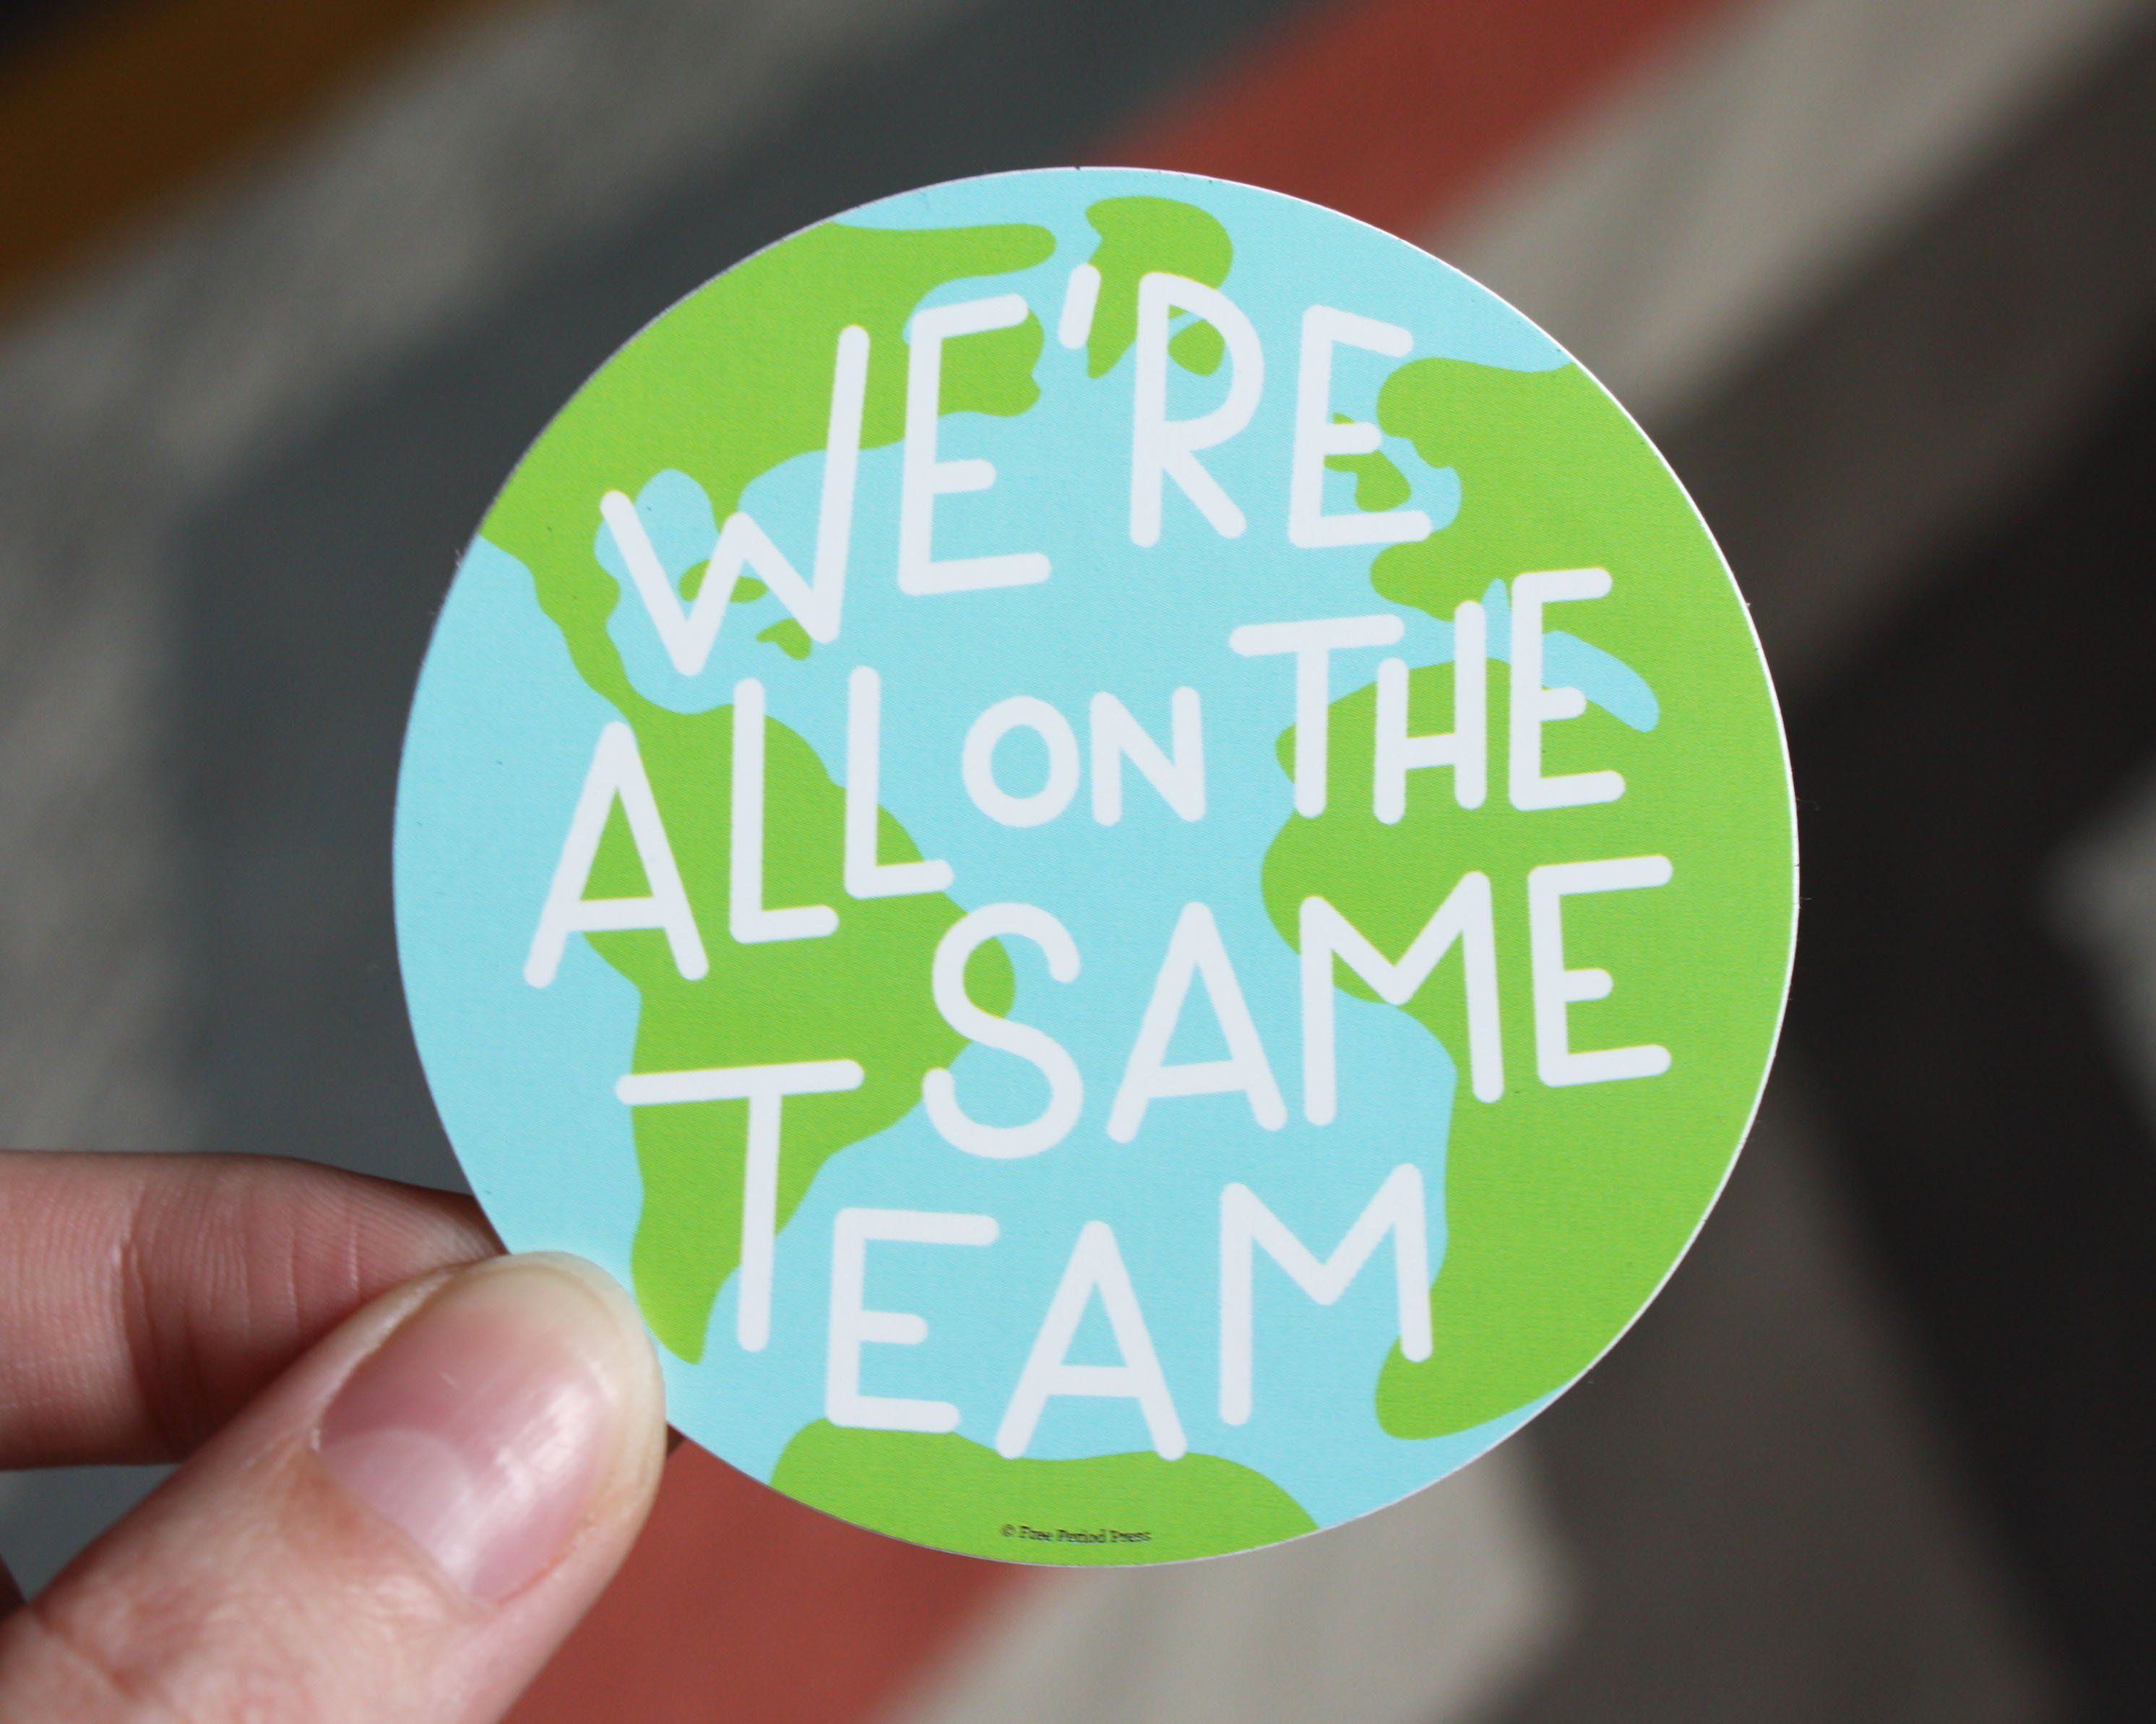 We Re All On The Same Team Vinyl Decal Sticker Free Period Press Bottle Stickers Vinyl Sticker Vinyl Decal Stickers [ 2386 x 2984 Pixel ]